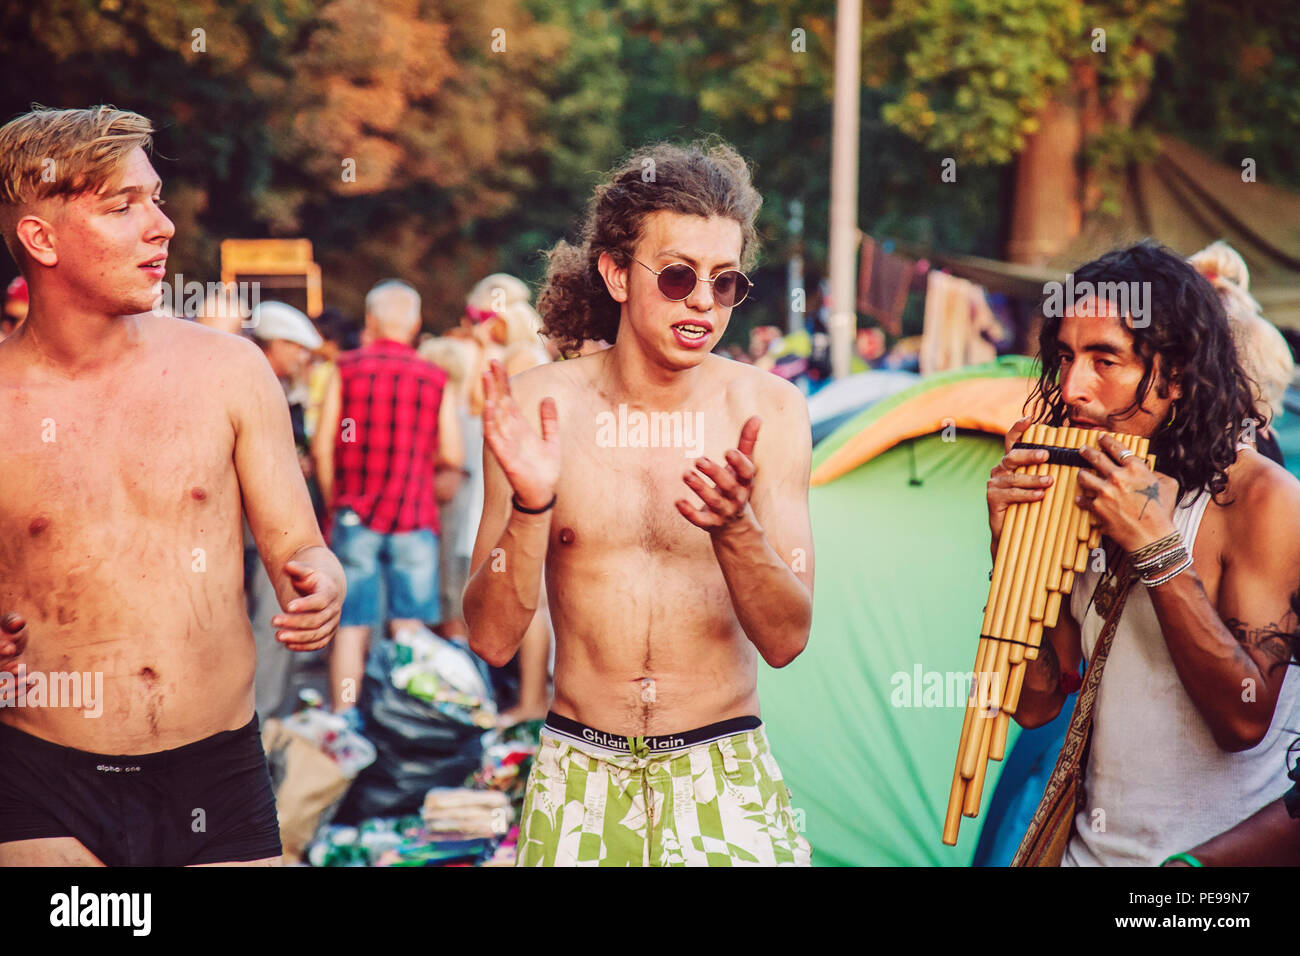 Kostrzyn nad Odra, Polonia, 4 de agosto de 2018, Woodstock Polonia Rock festival visitantes Imagen De Stock